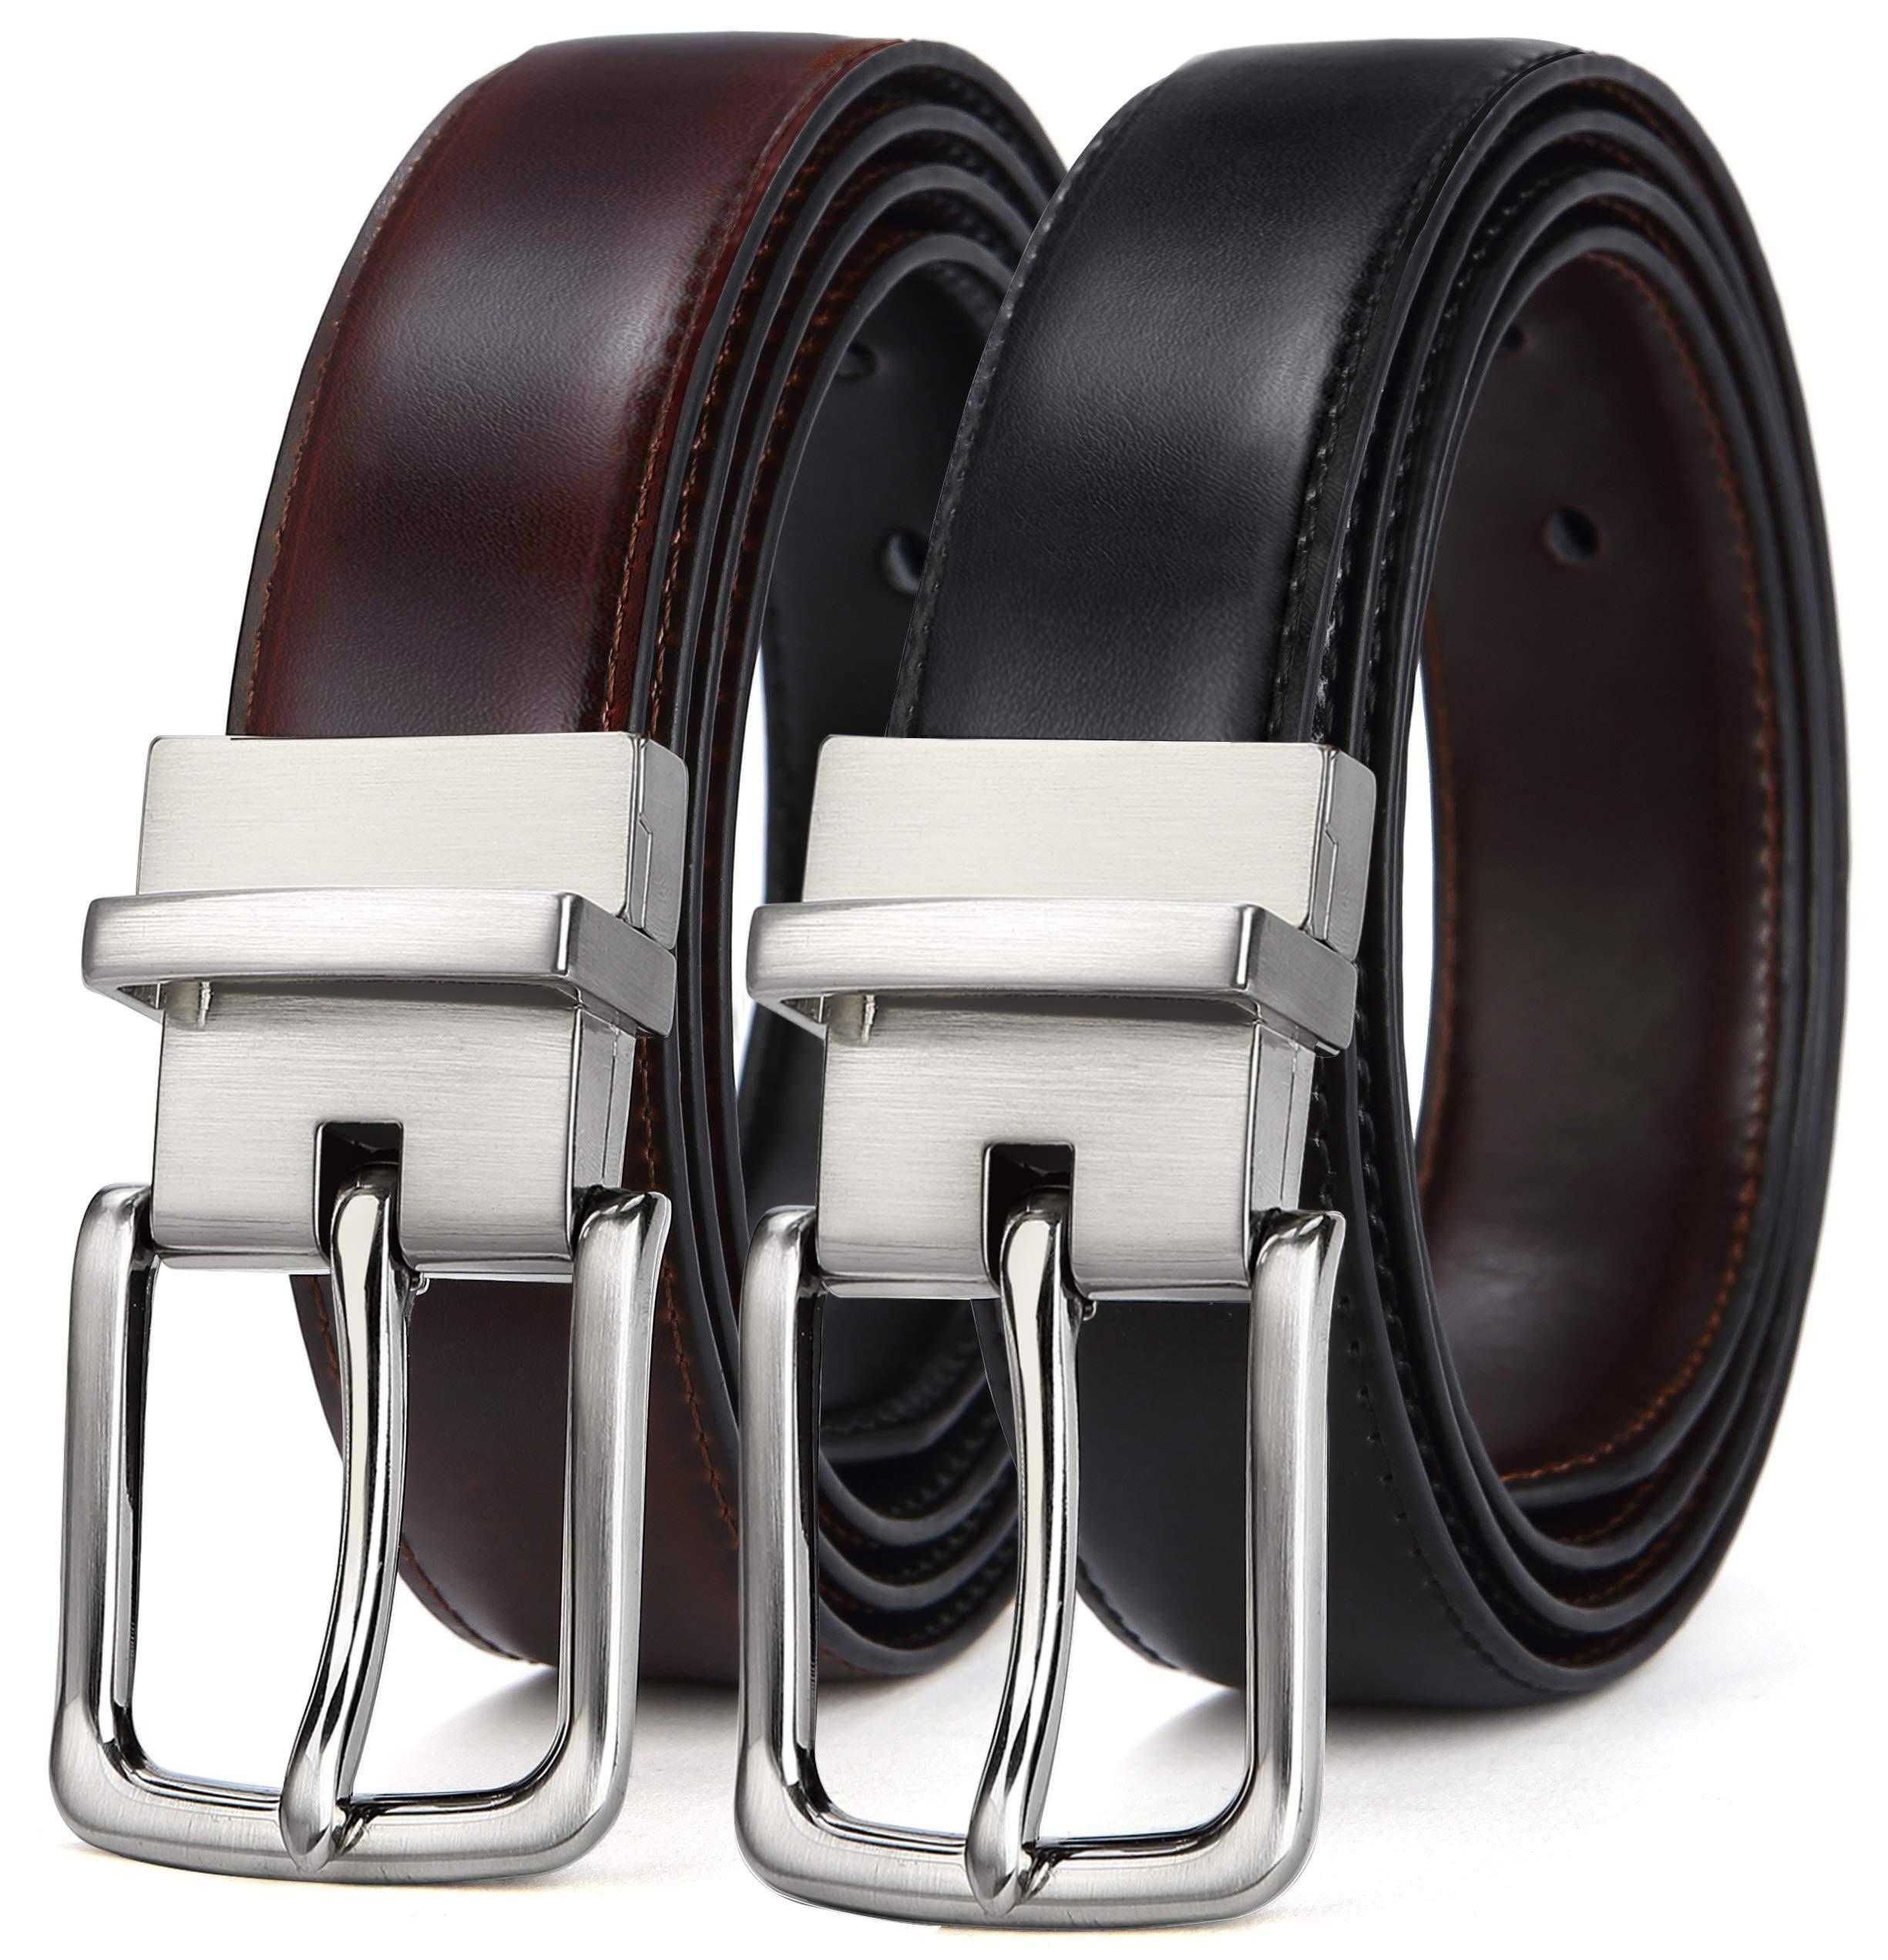 One Belt Reversible for Two Colors Belt for Men,Bulliant Mens Reversible Leather Belt with Holes